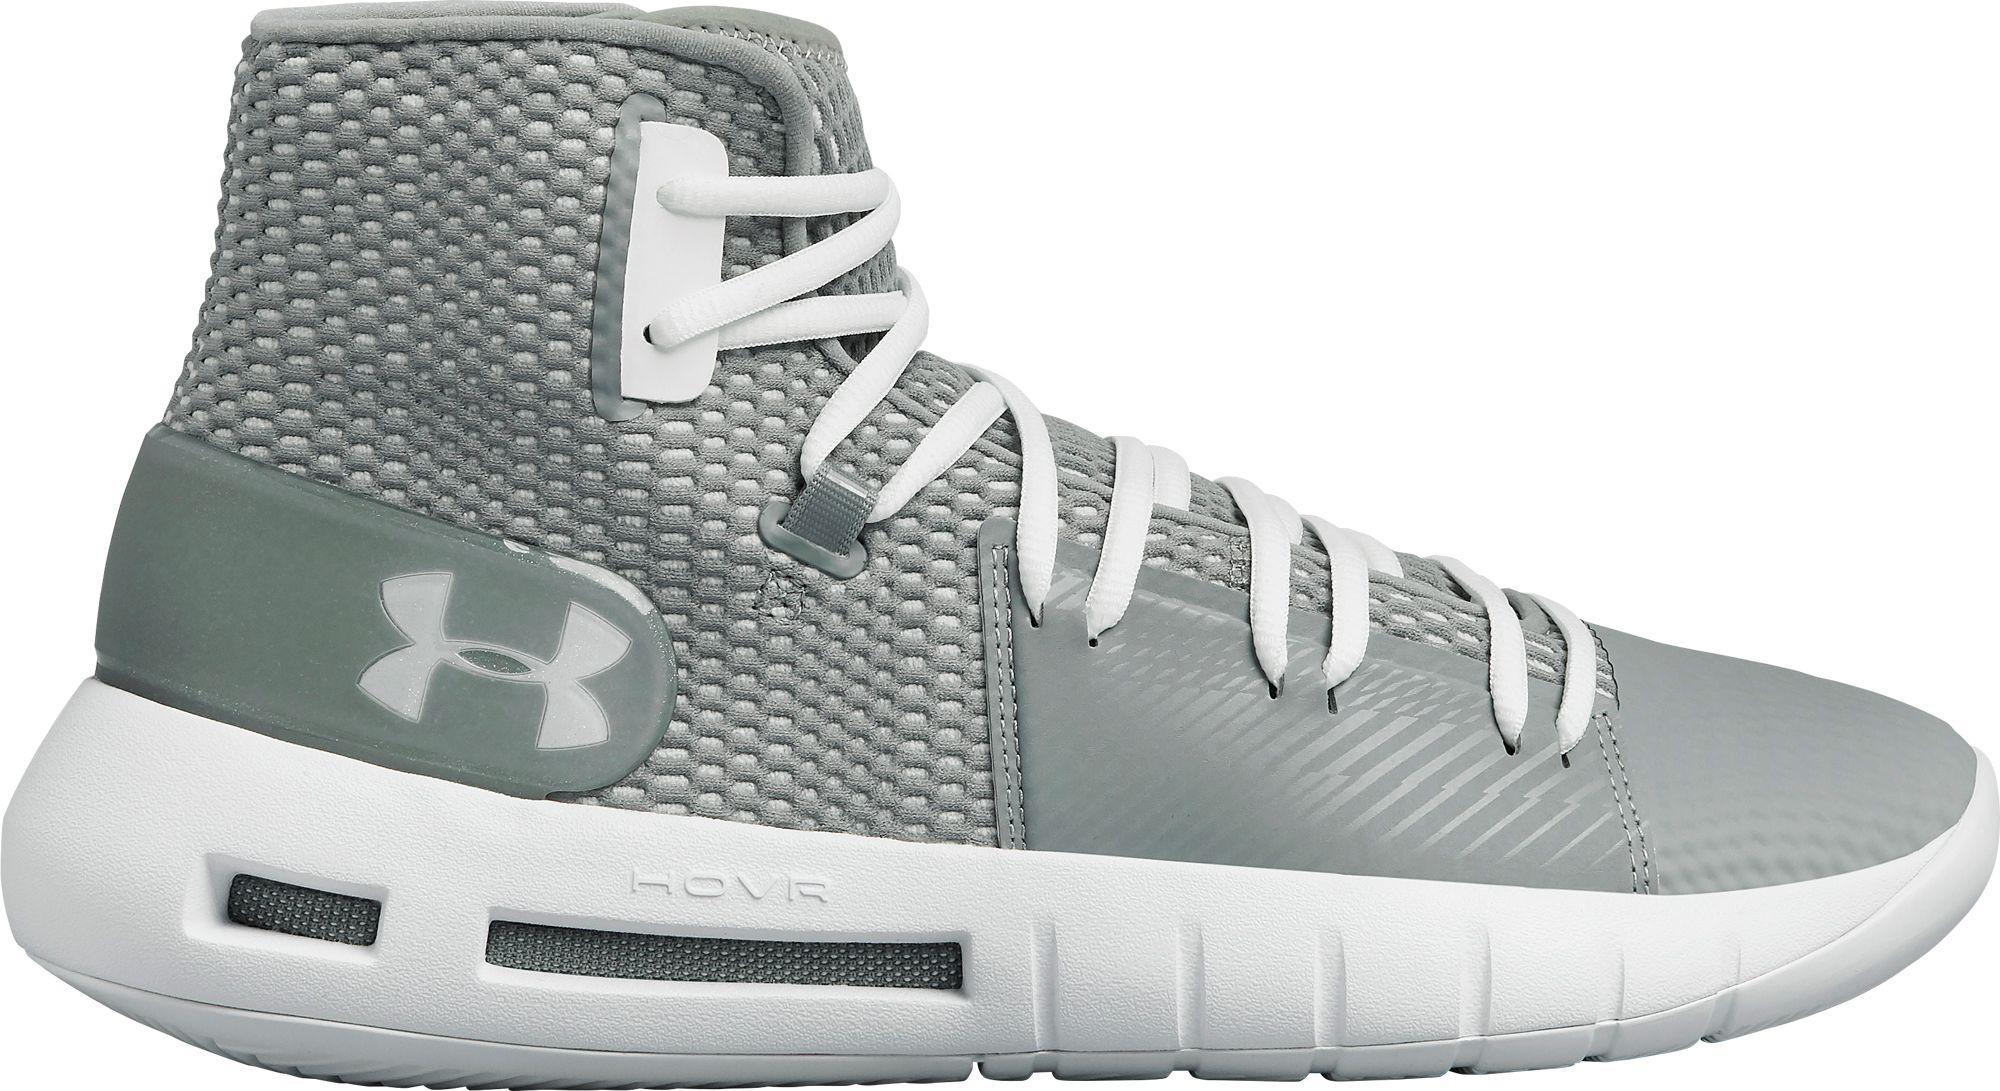 dfef711c5af Mens Under Armour Hovr Havoc Mid Basketball Shoes